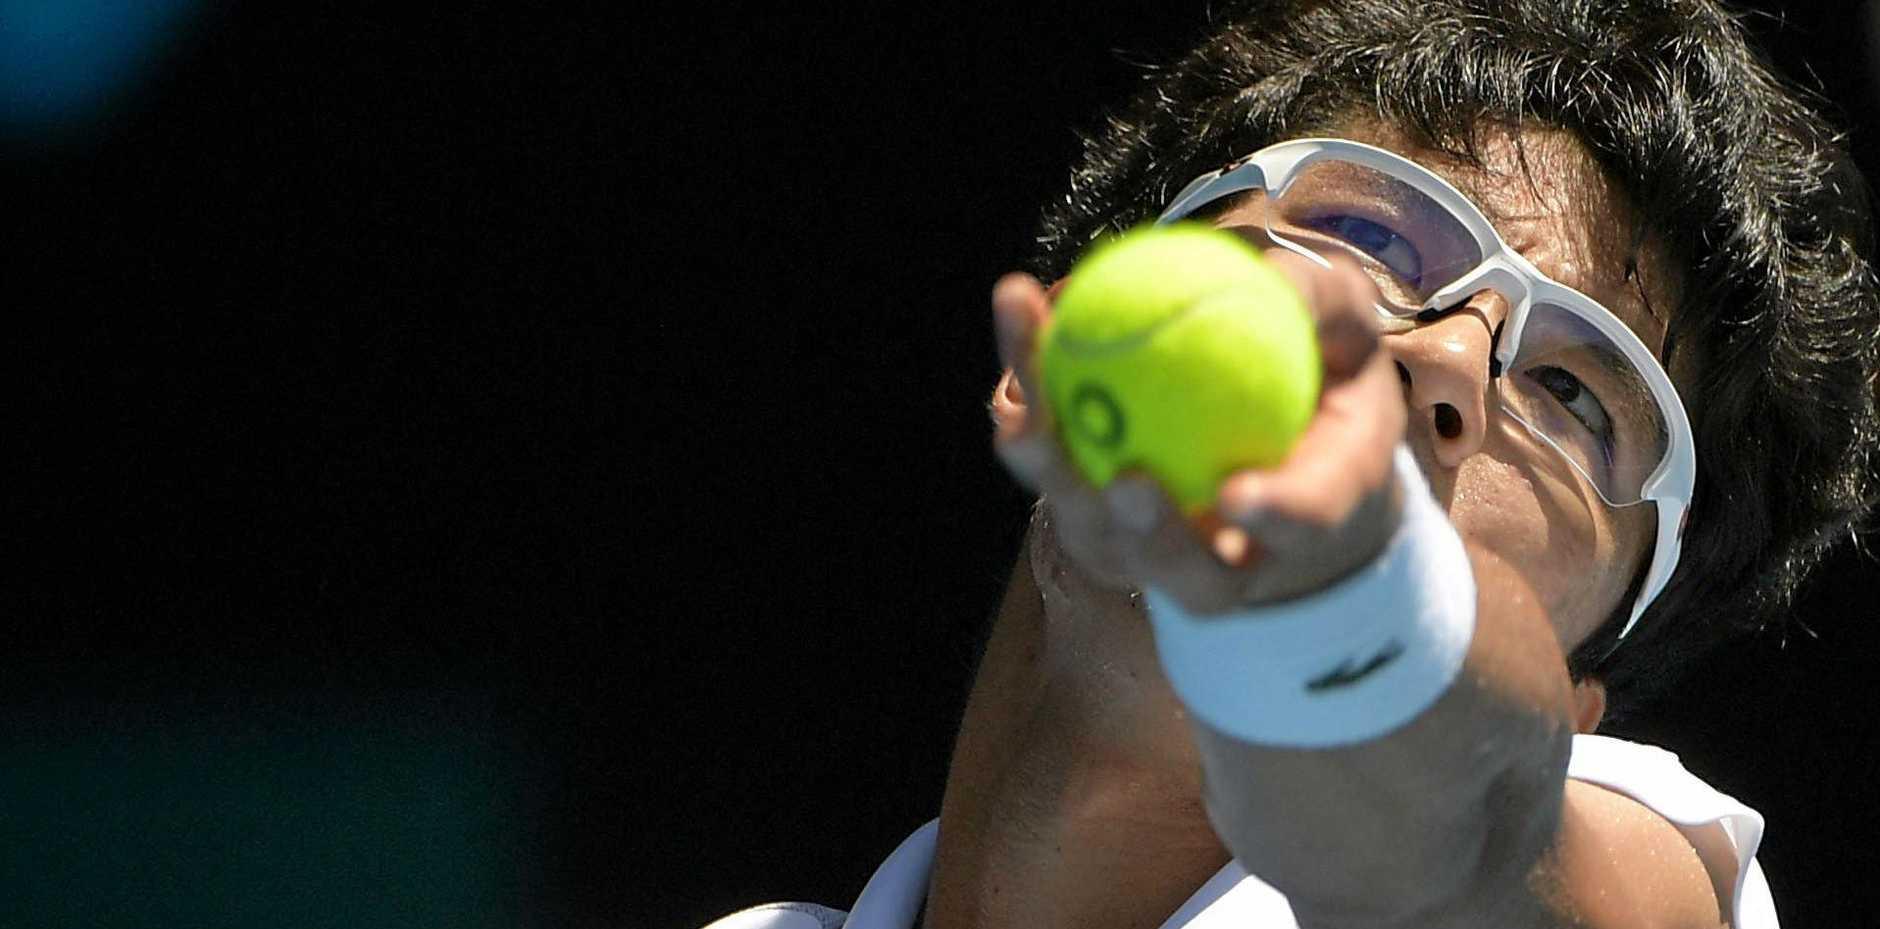 Hyeon Chung will battle Roger Federer for a spot in the Australian Open final.